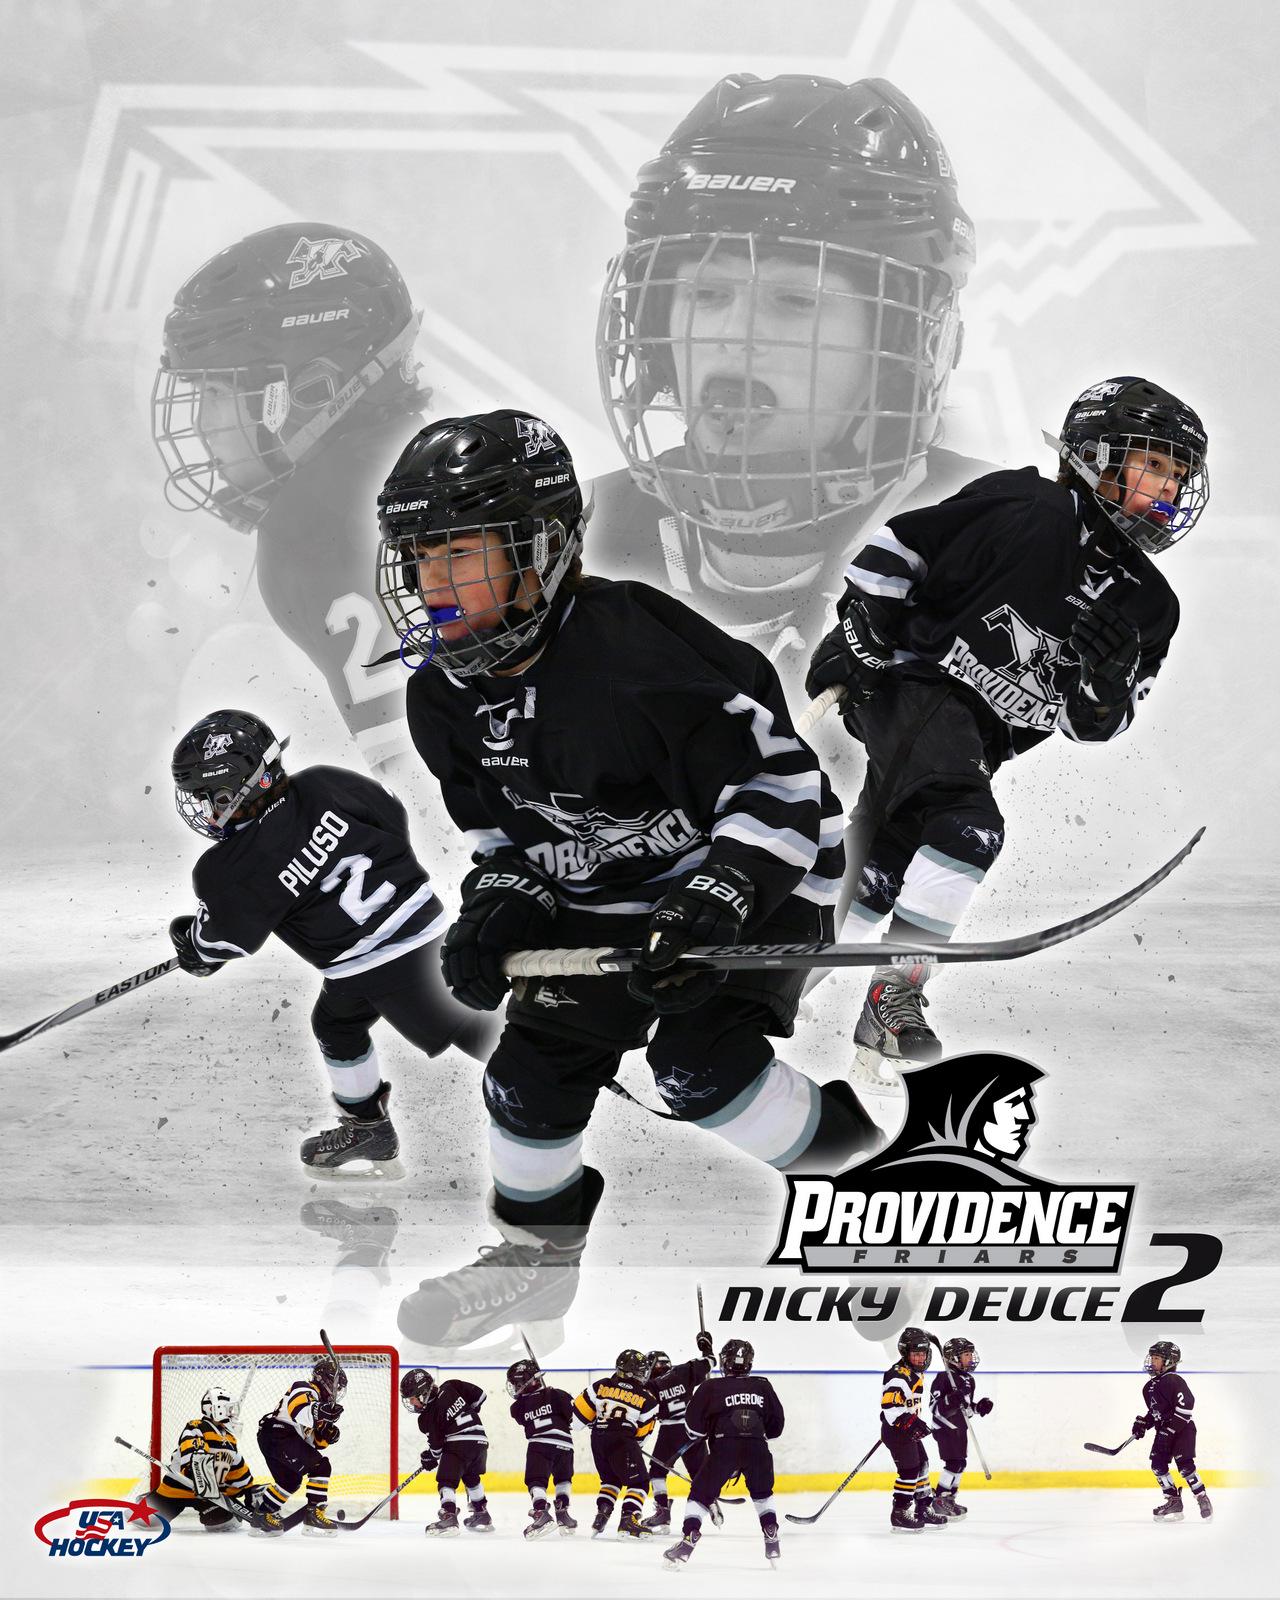 SilverPeak Studios Commemorative Poster Samples Action Sports Hockey Photography (10)